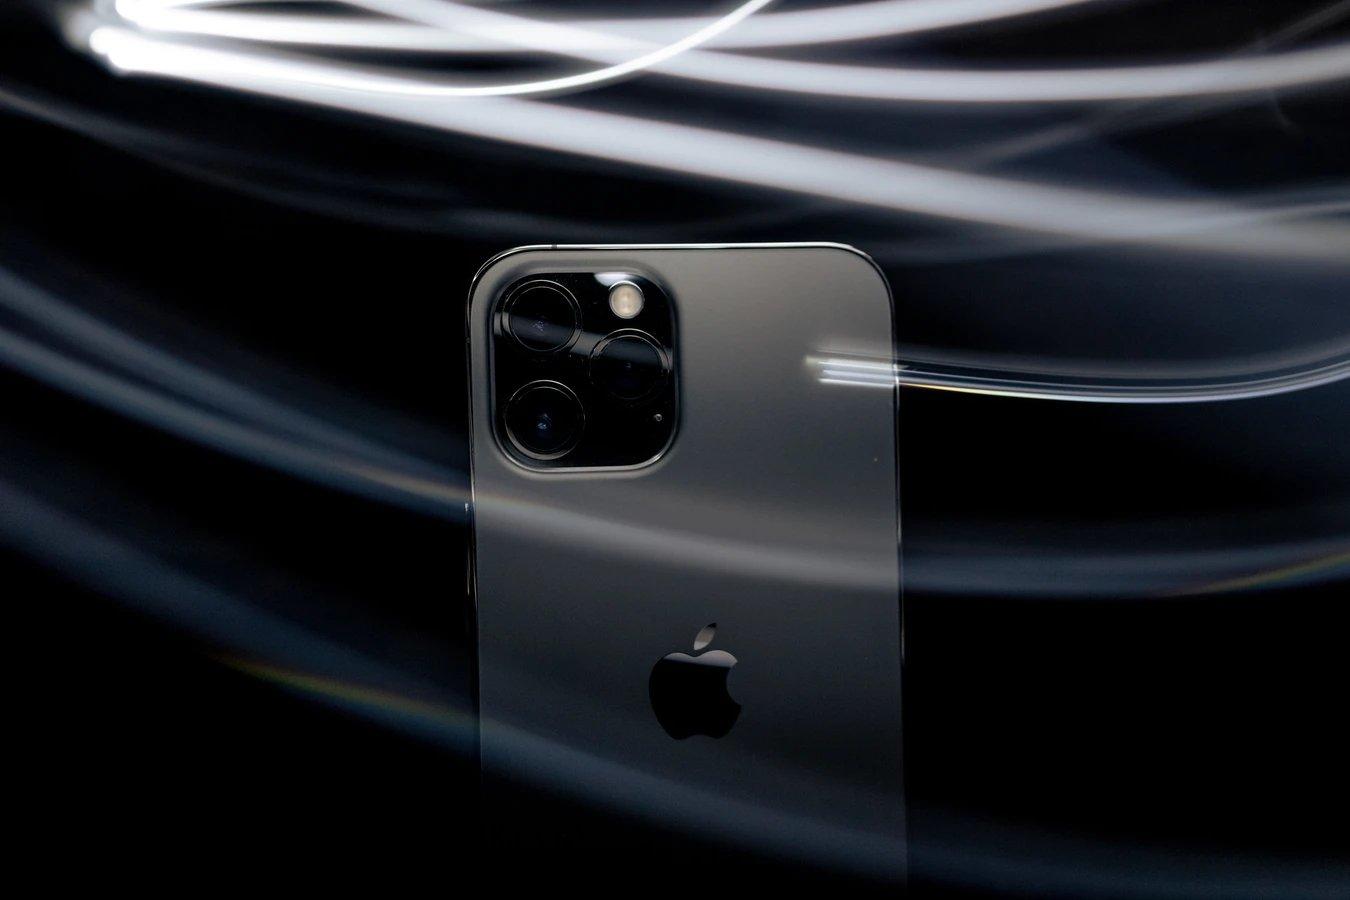 iPhone junto a espelho